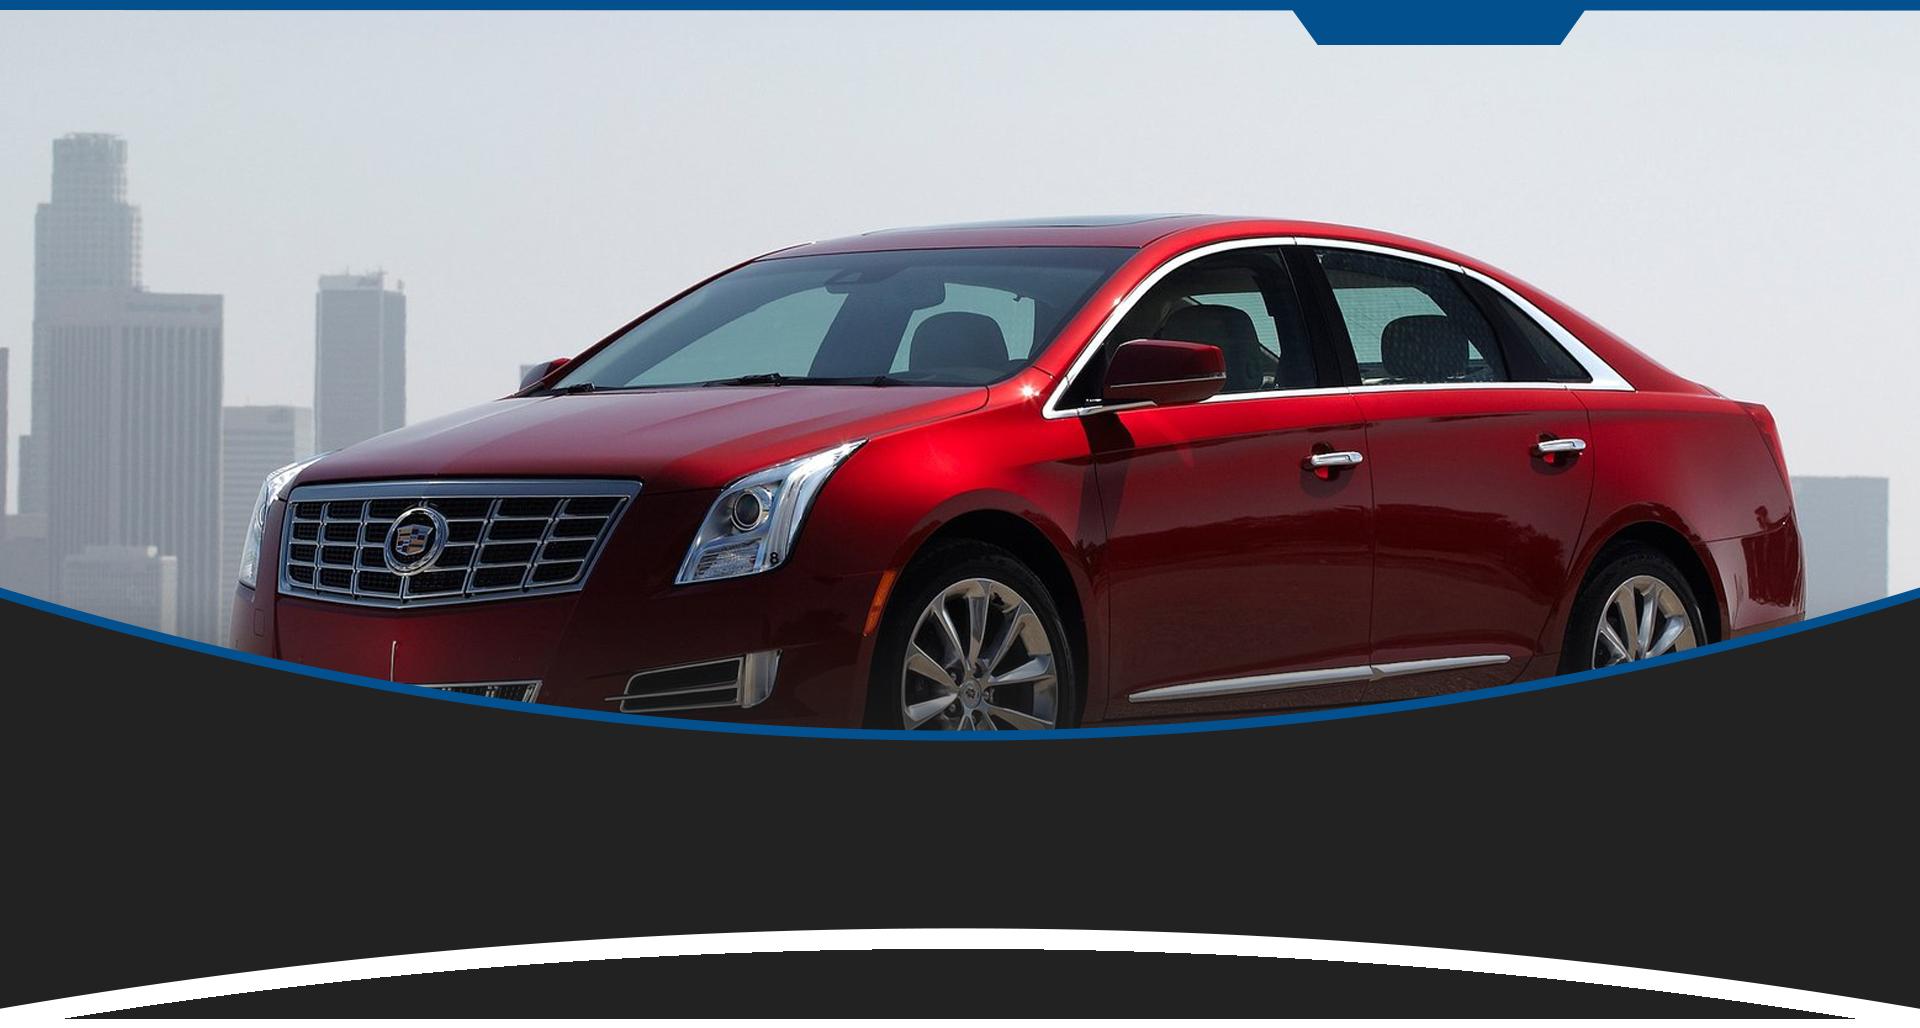 Acura Springfield Mo >> East Coast Auto Sales llc - Used Cars - Virginia Beach VA ...